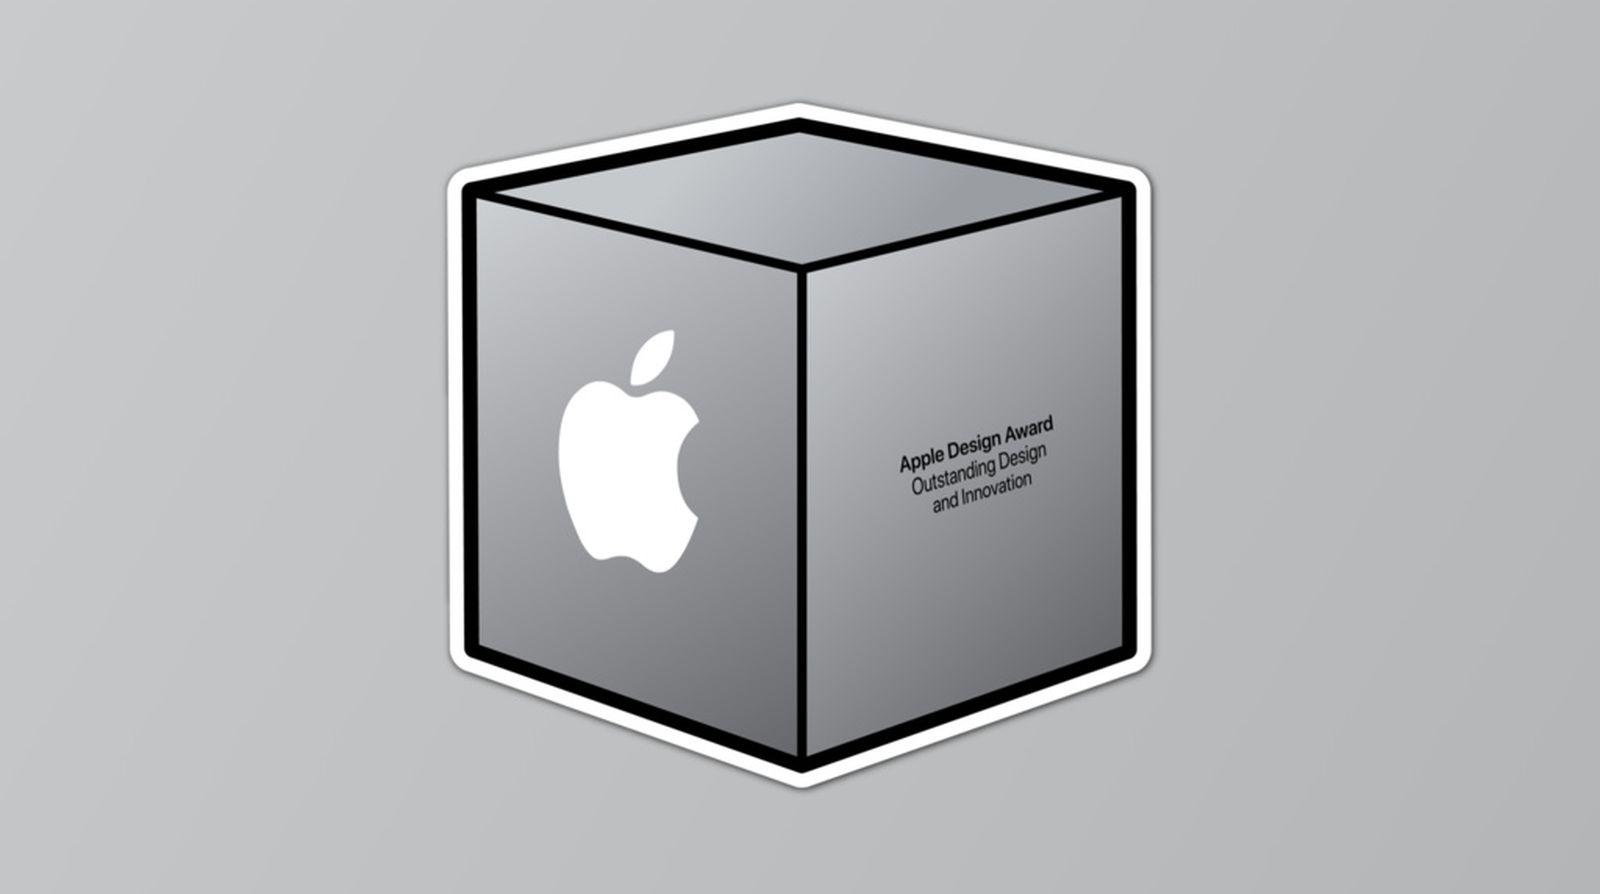 apple design awards tit